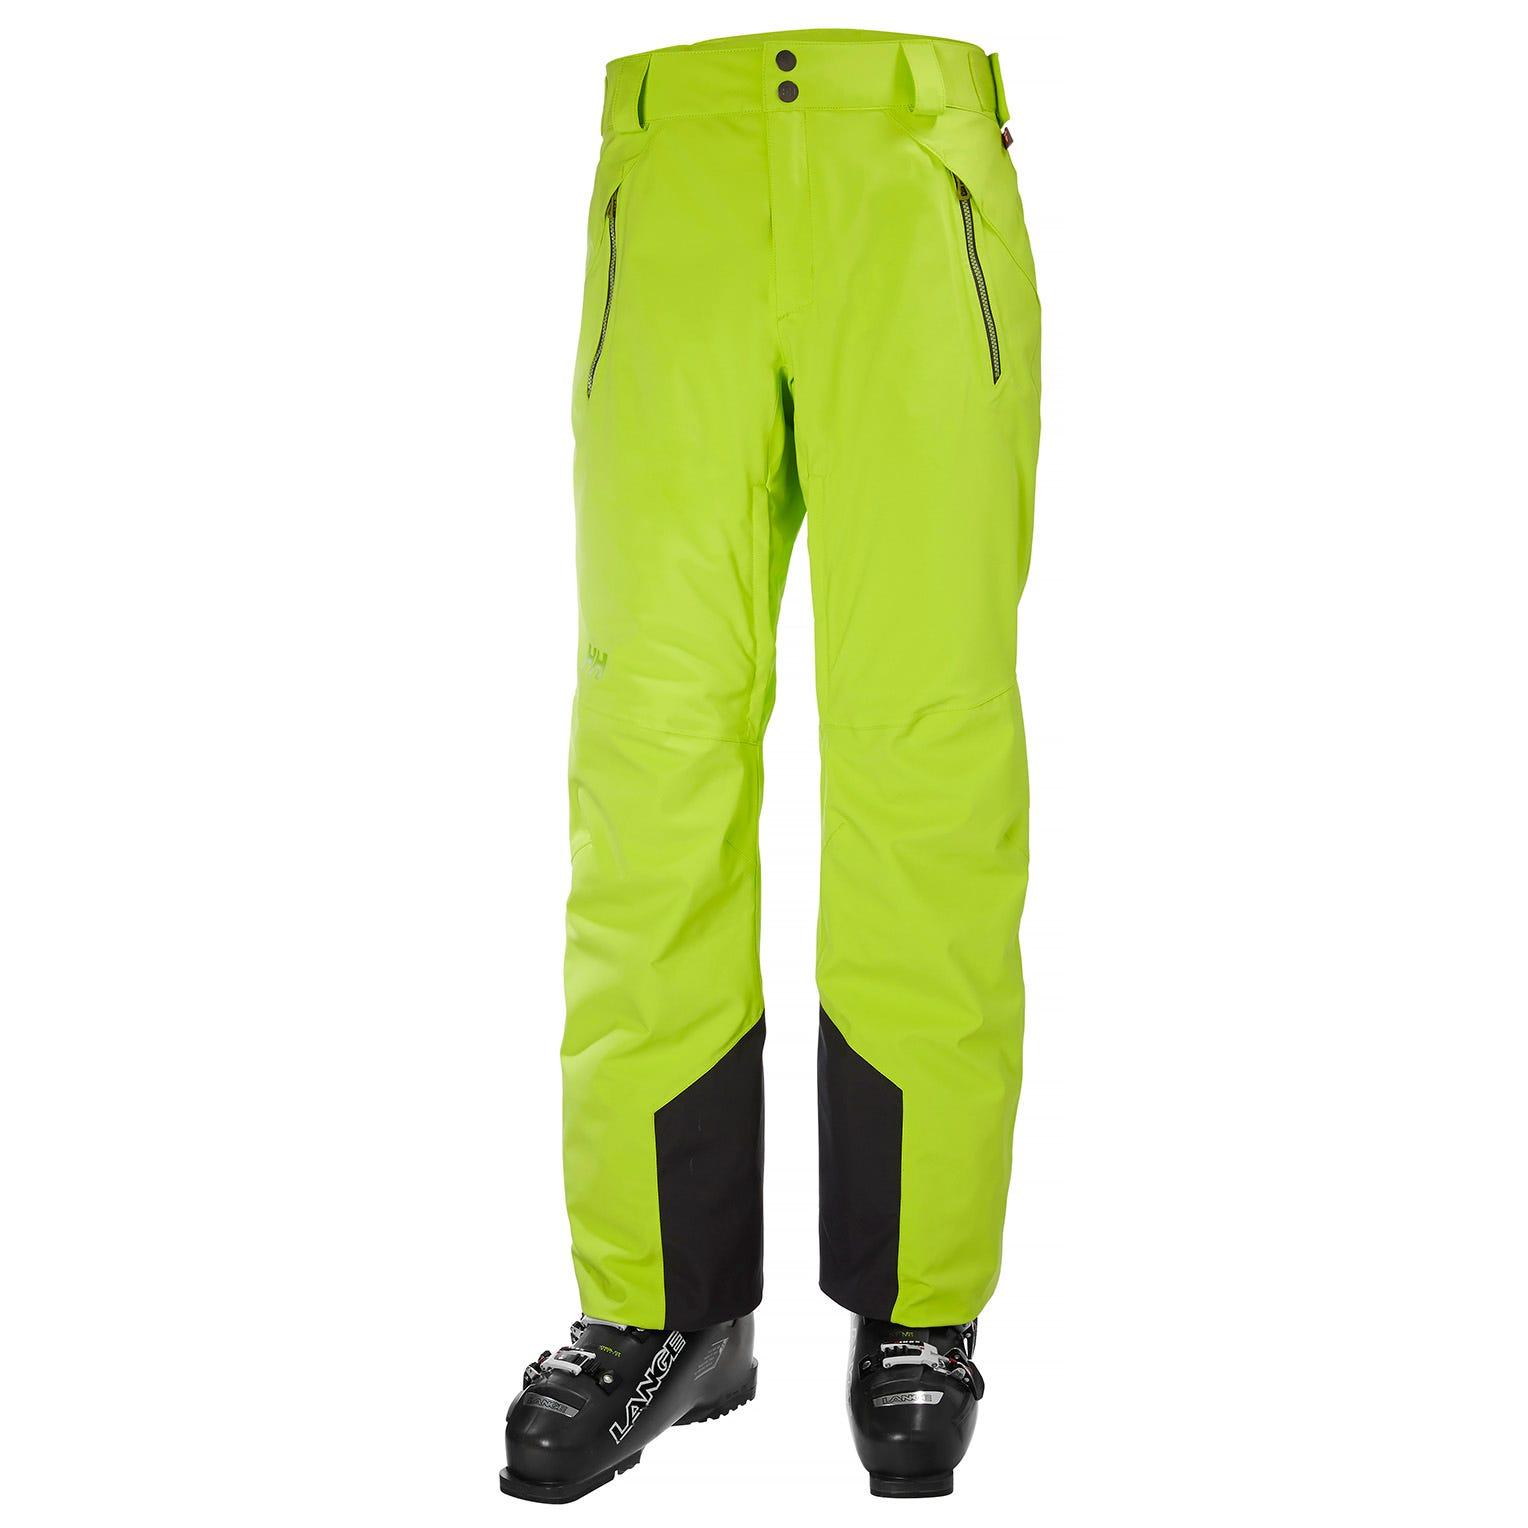 Helly Hansen Force Pant Mens Ski Yellow M